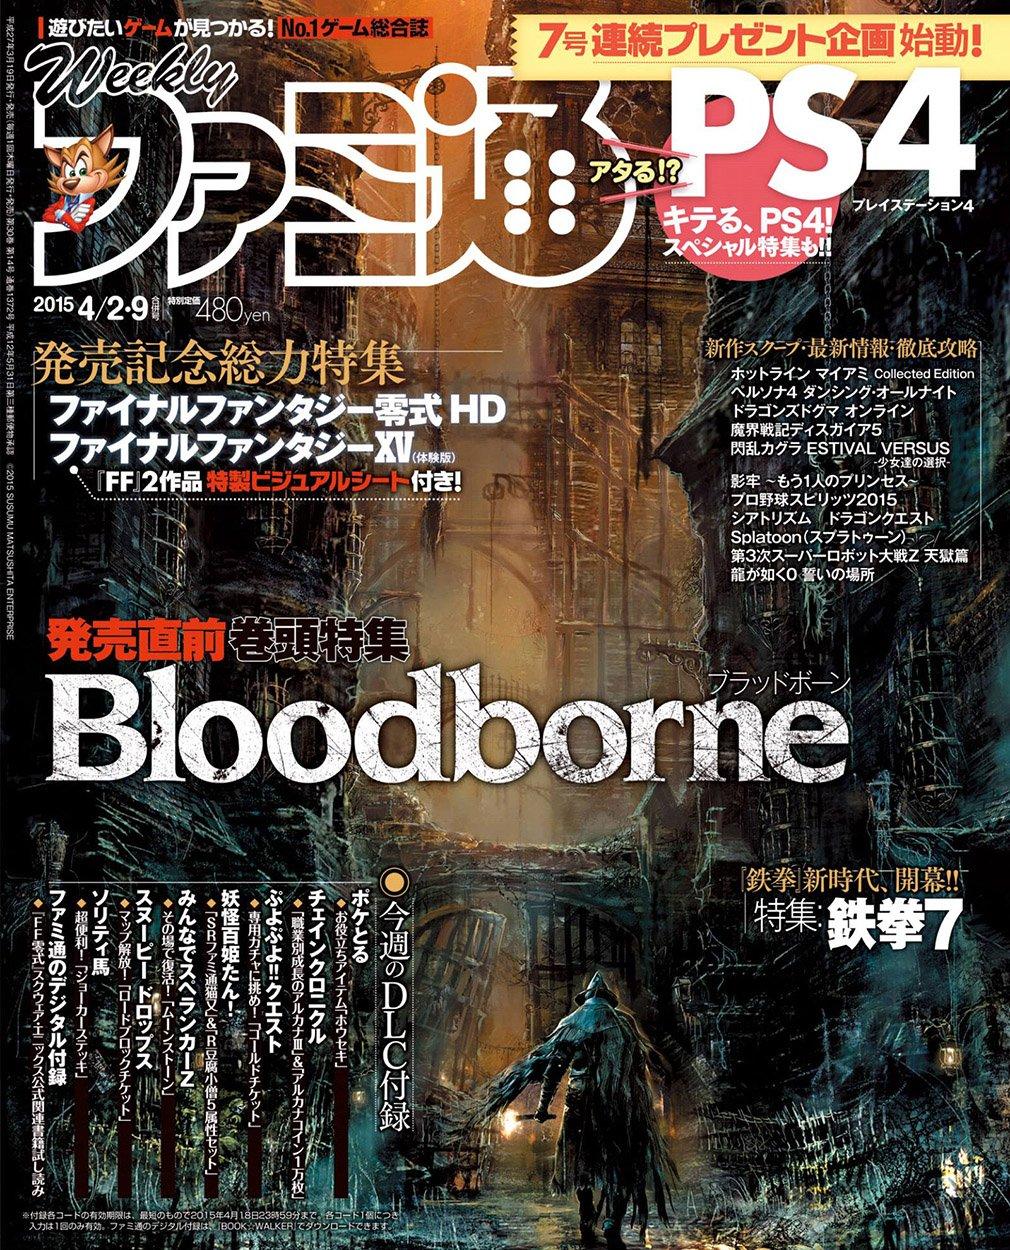 Famitsu 1372 April 2/9, 2015